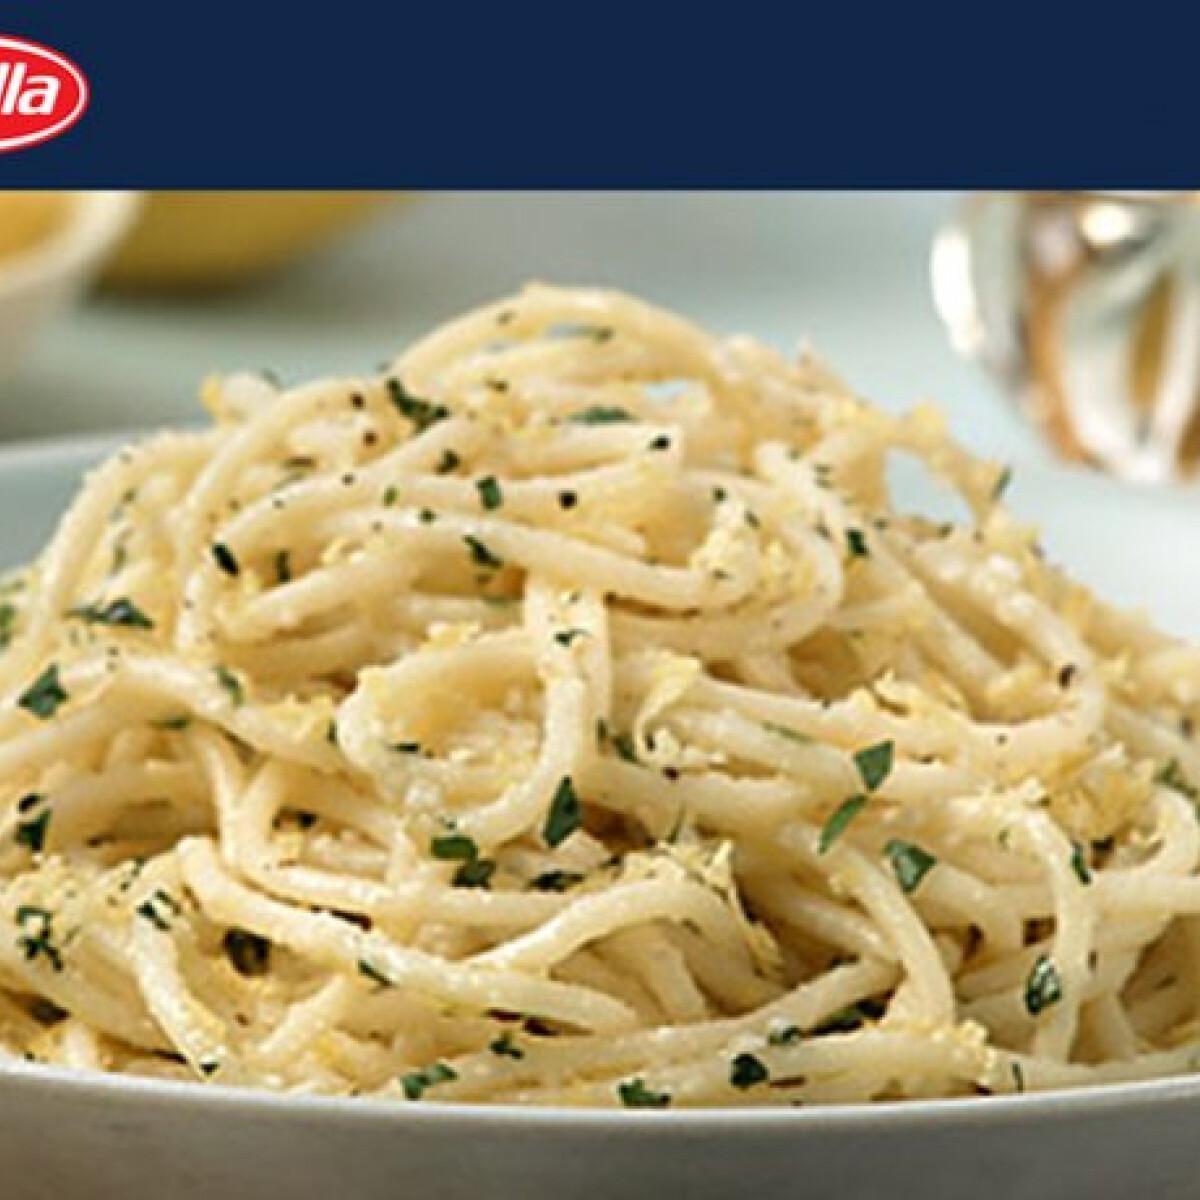 Citromos spagetti Barillától